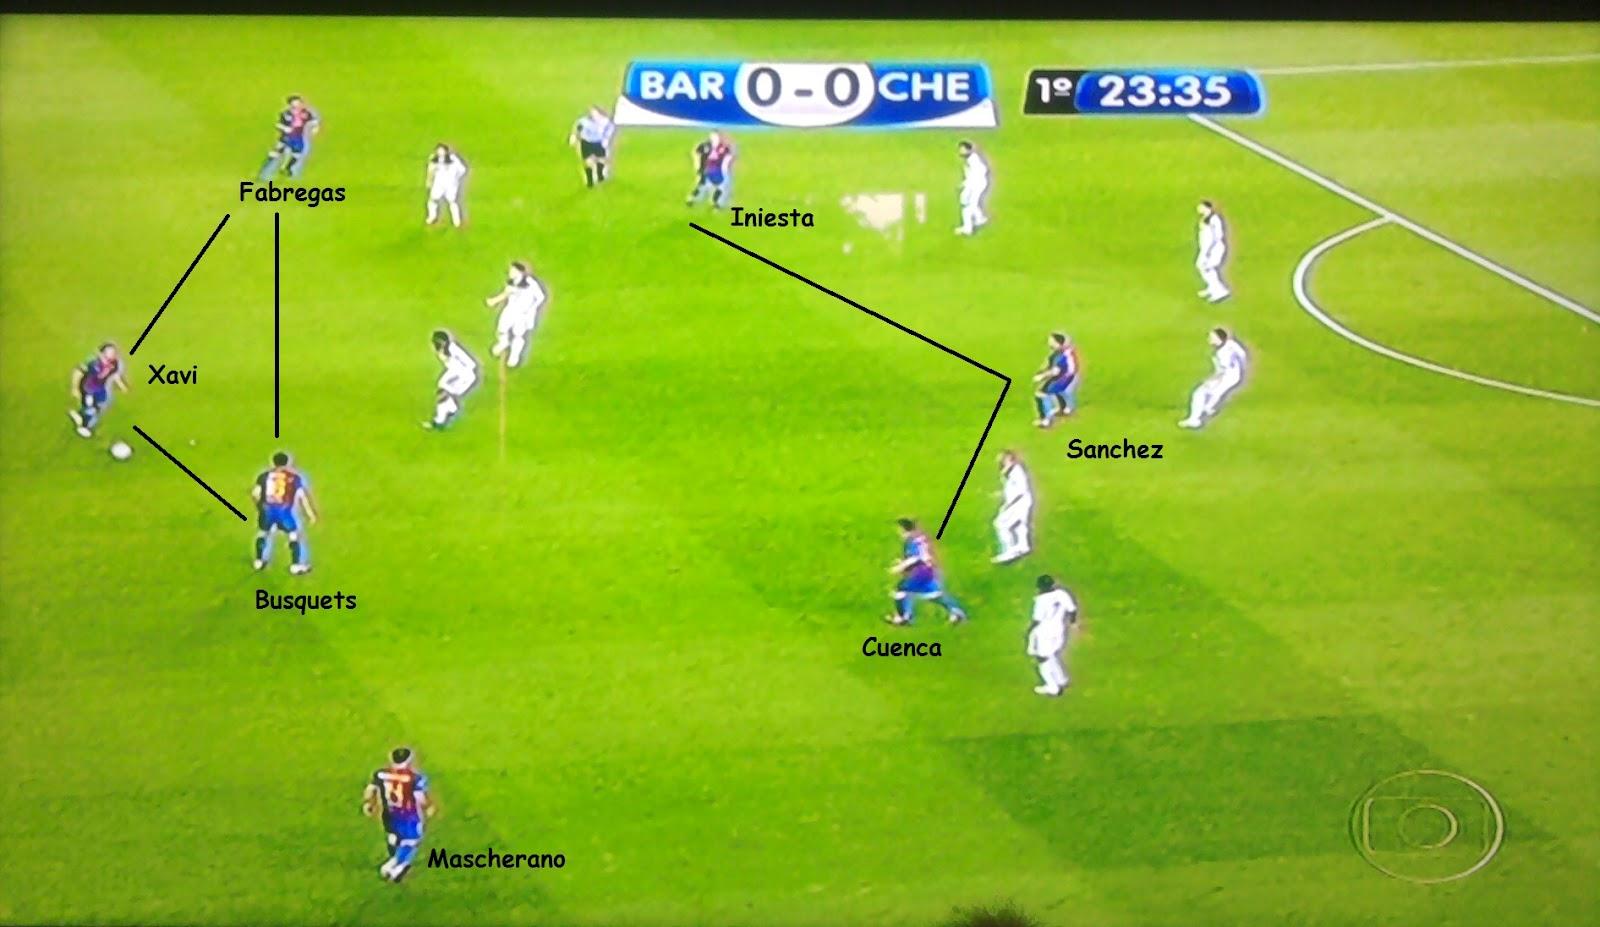 3fcc2093b1 Flagrante tático. Barcelona com sete jogadores no campo ofensivo.  Mascherano elemento surpresa.